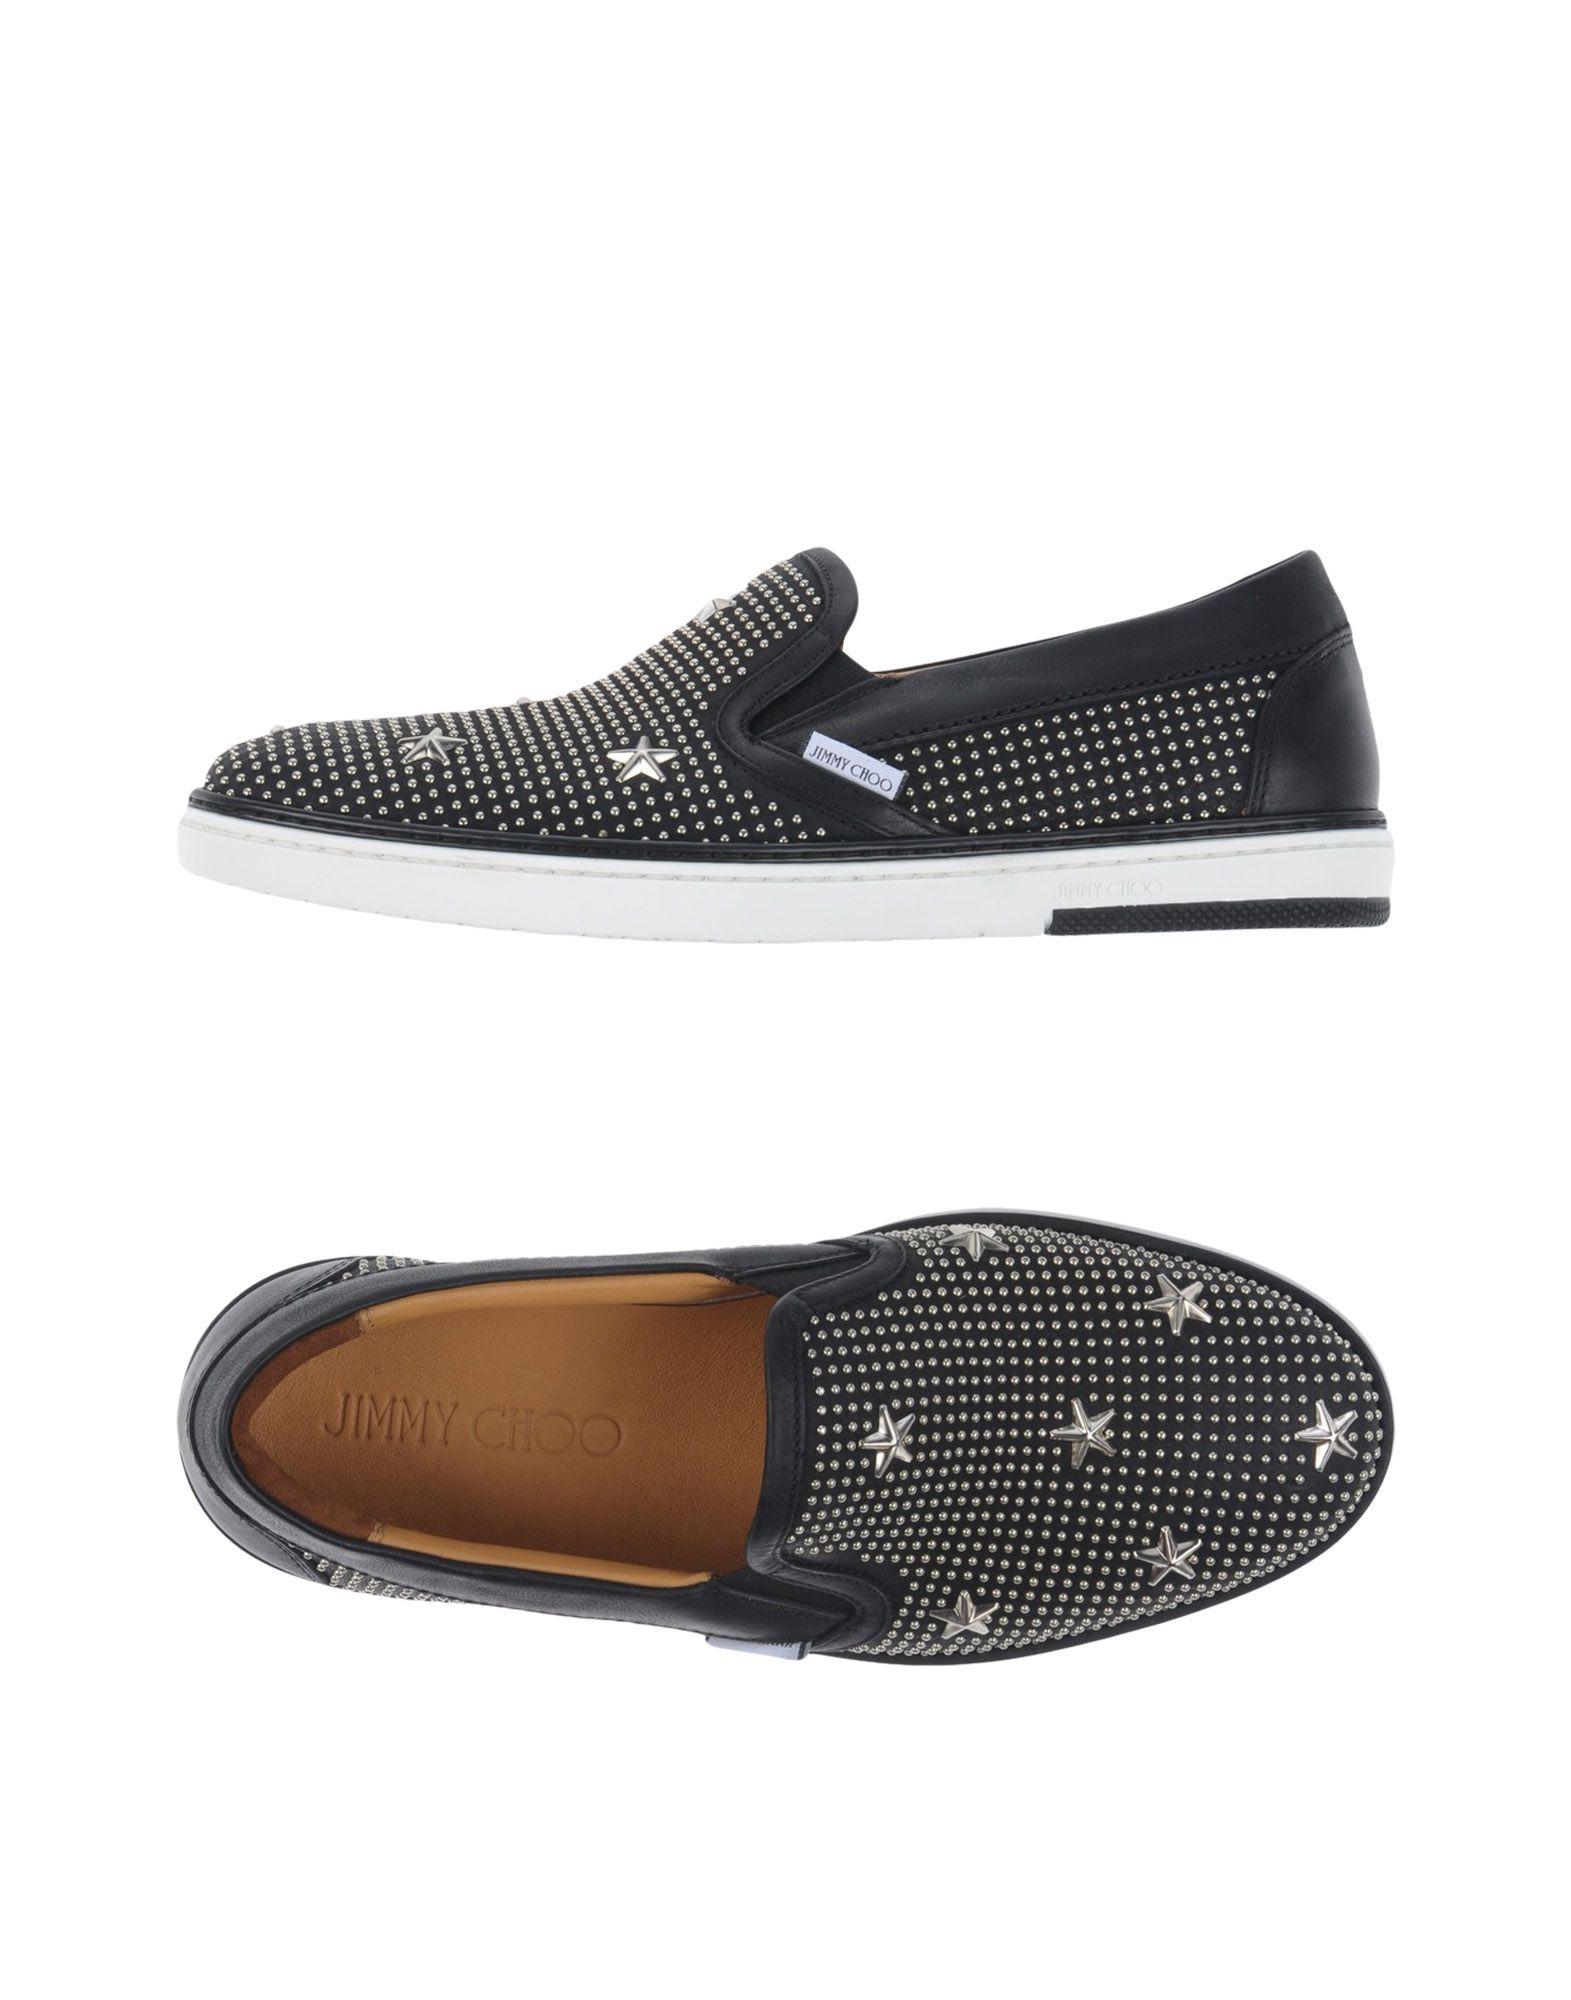 Jimmy Choo Sneakers Herren  11174396NP Gute Qualität beliebte Schuhe